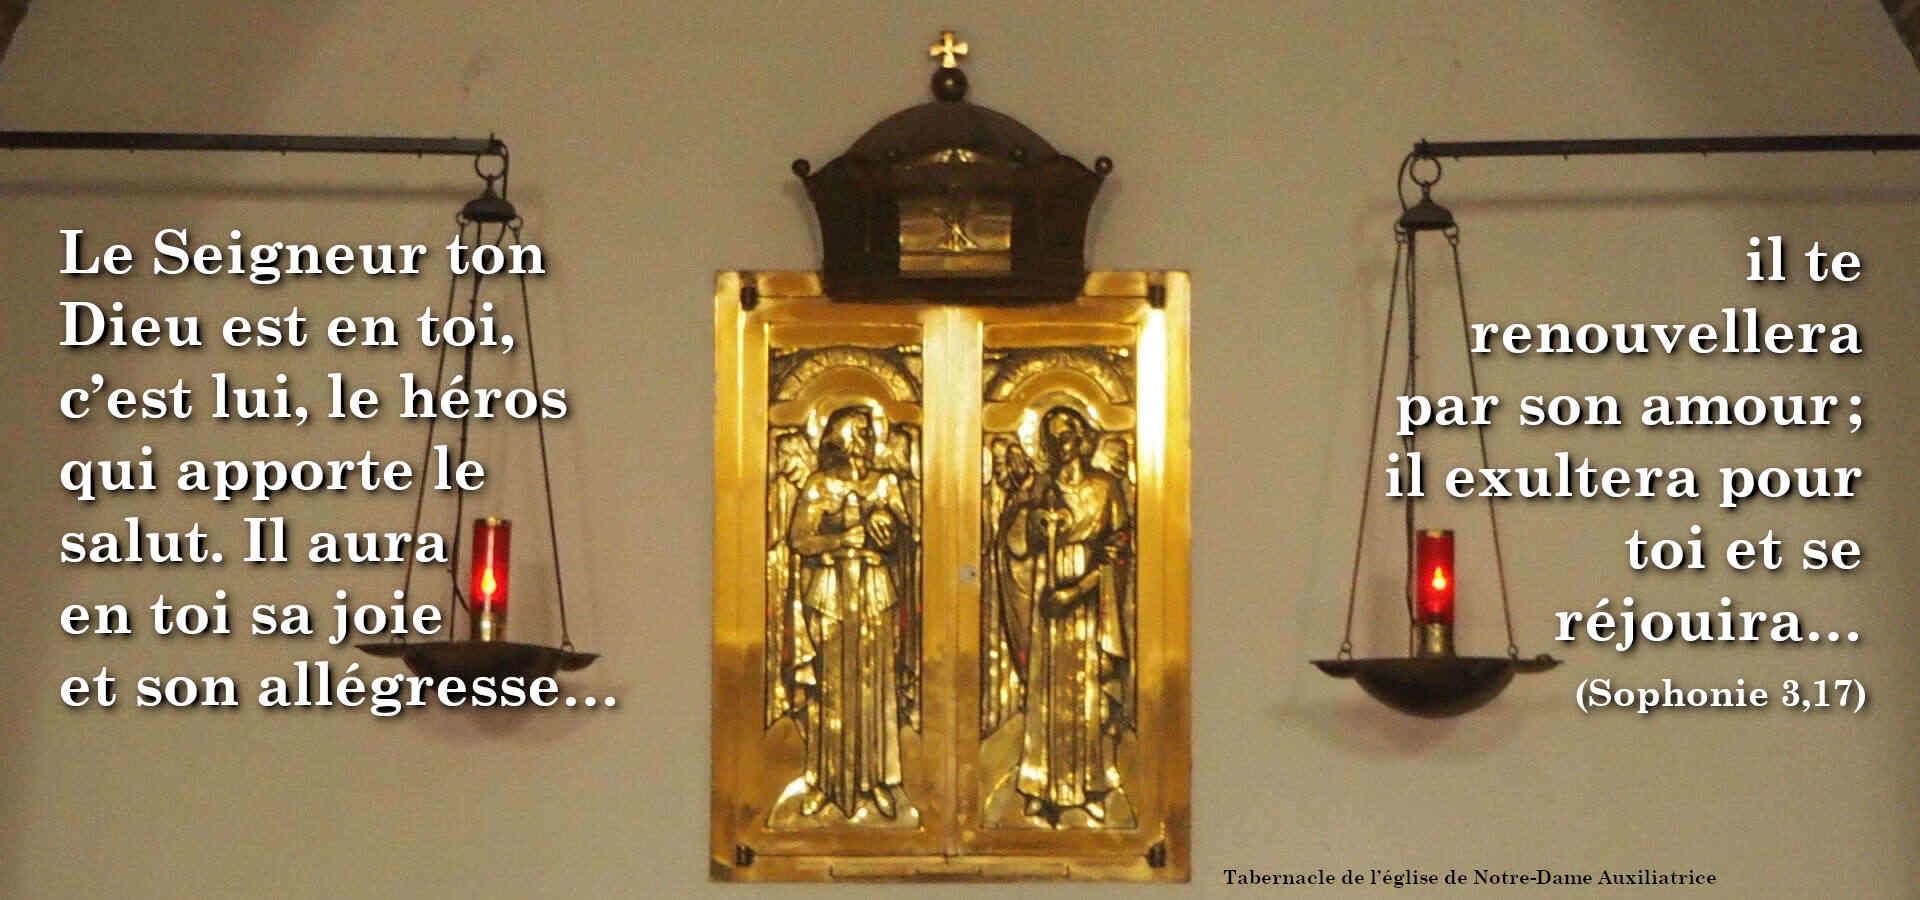 tabernacle, NDA 60